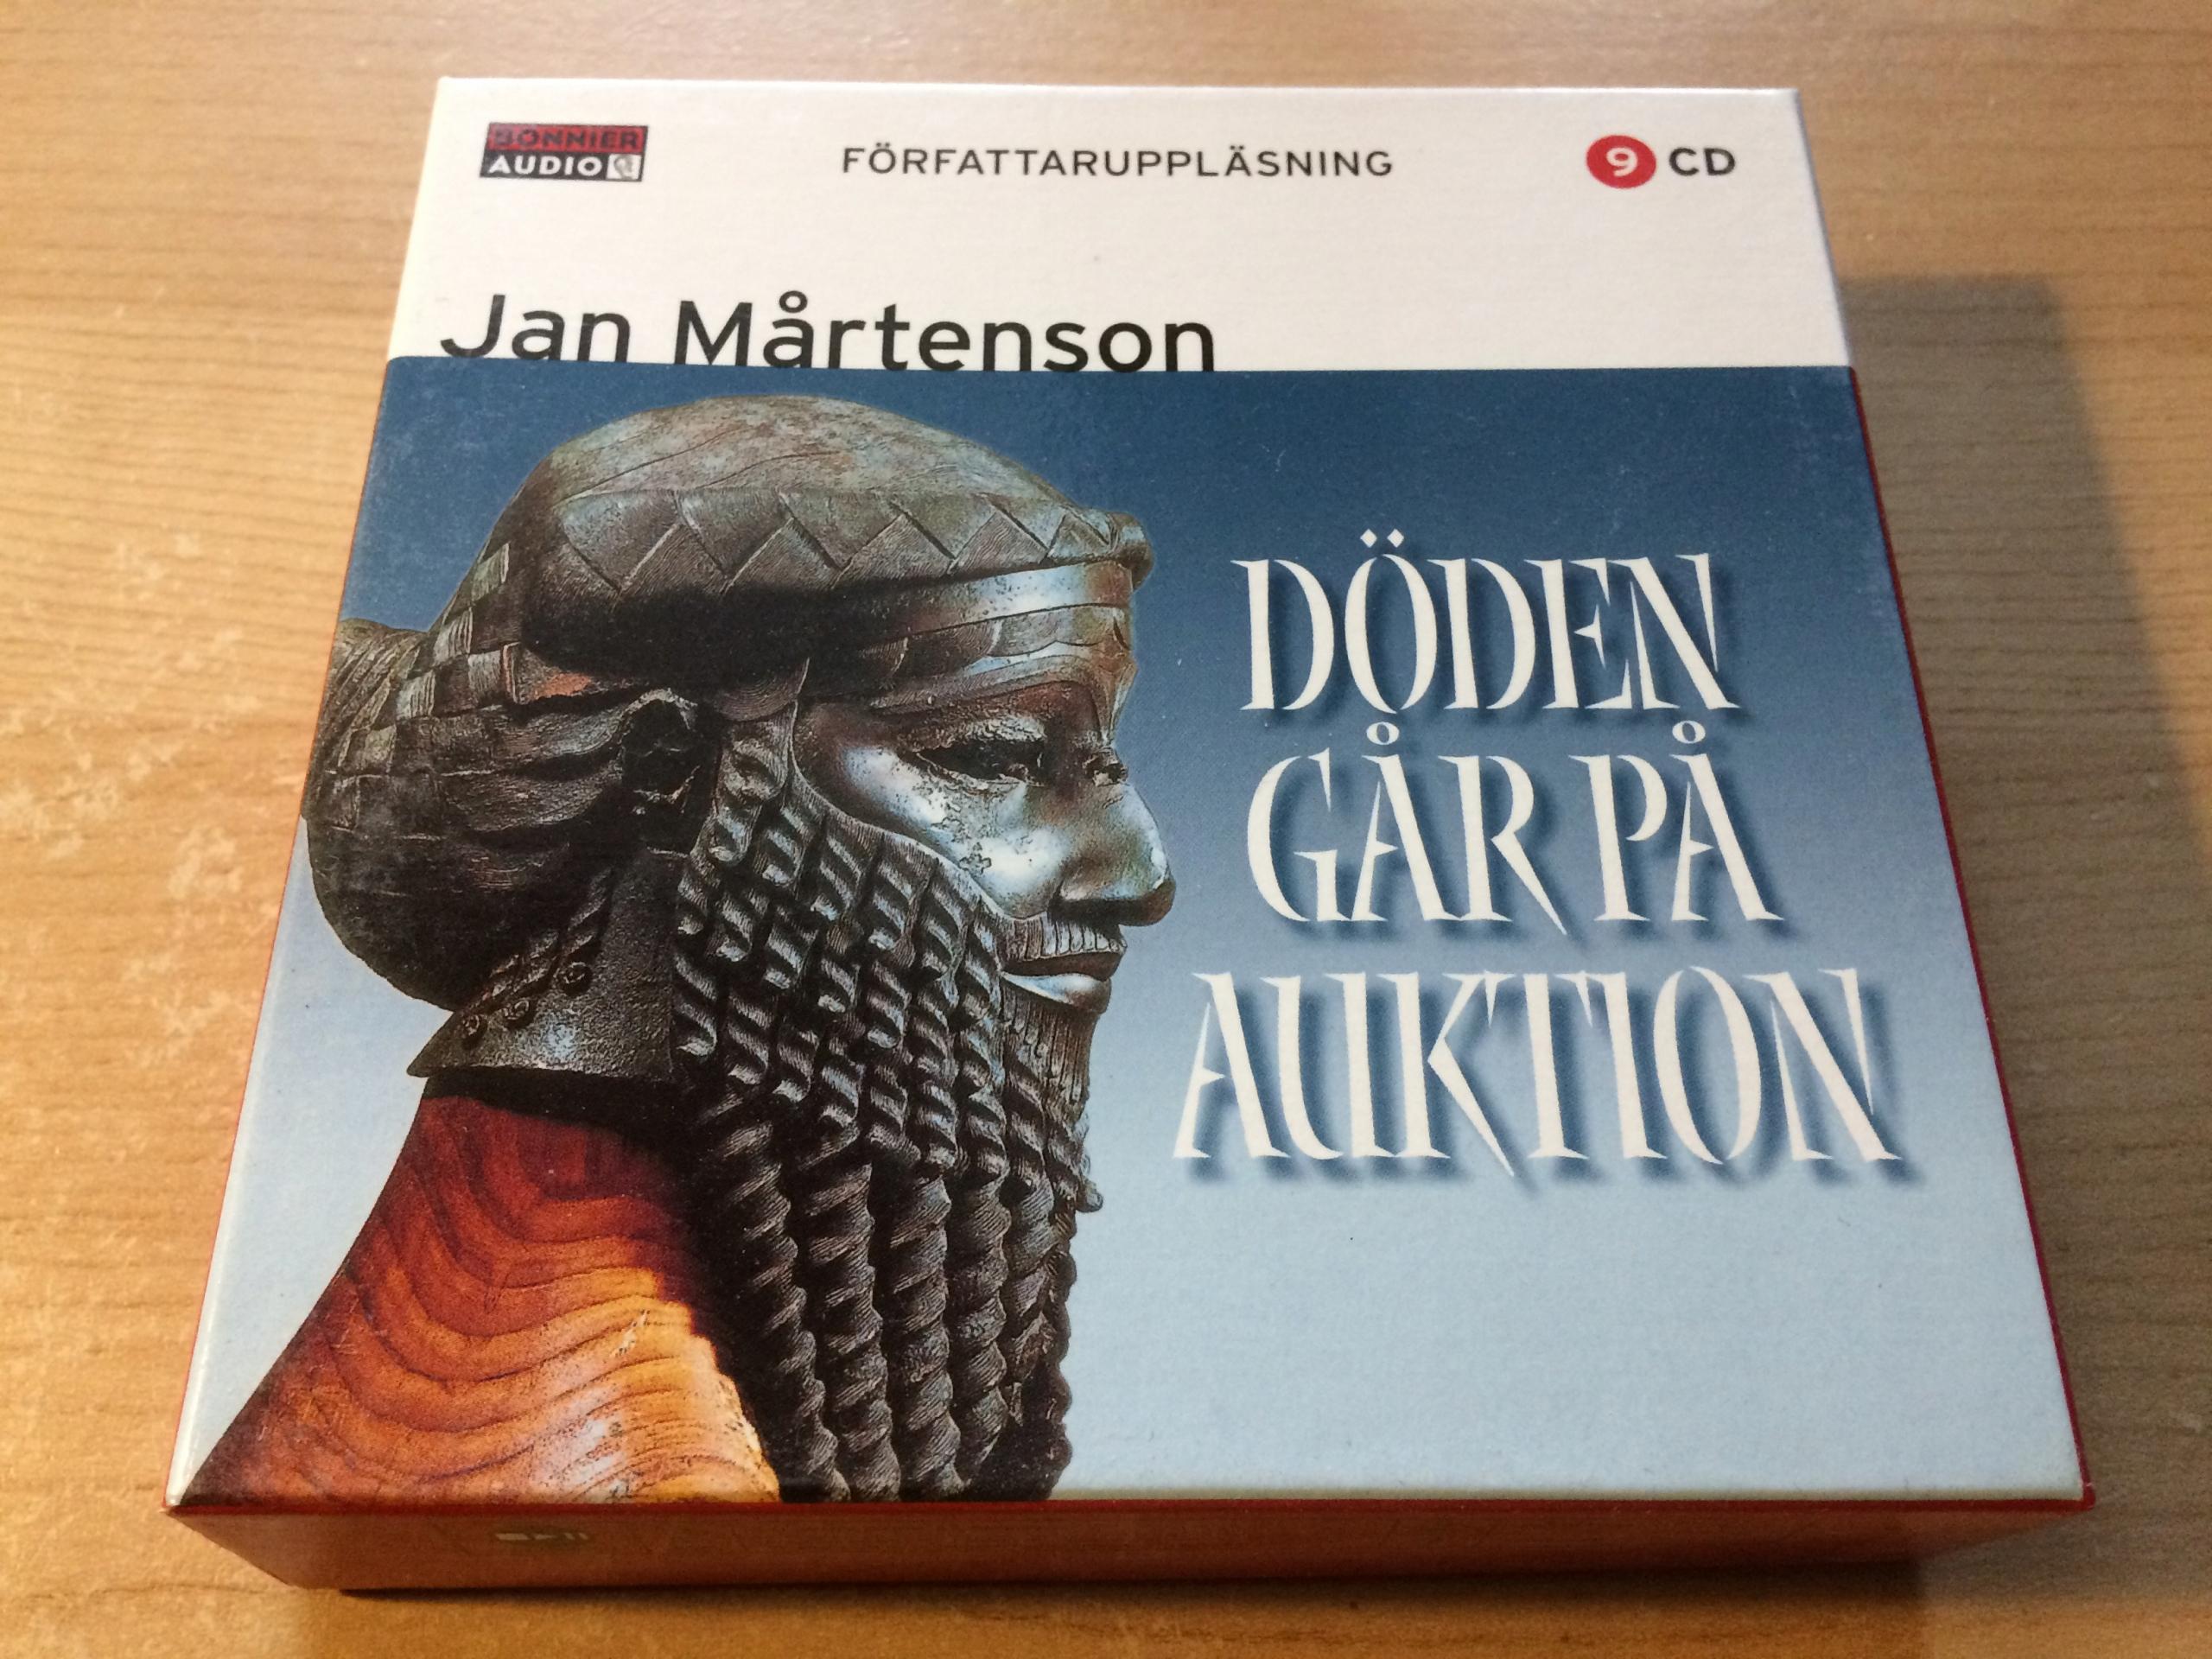 JAN MARTENSON DODEN GAR PA AUKTION 9CD